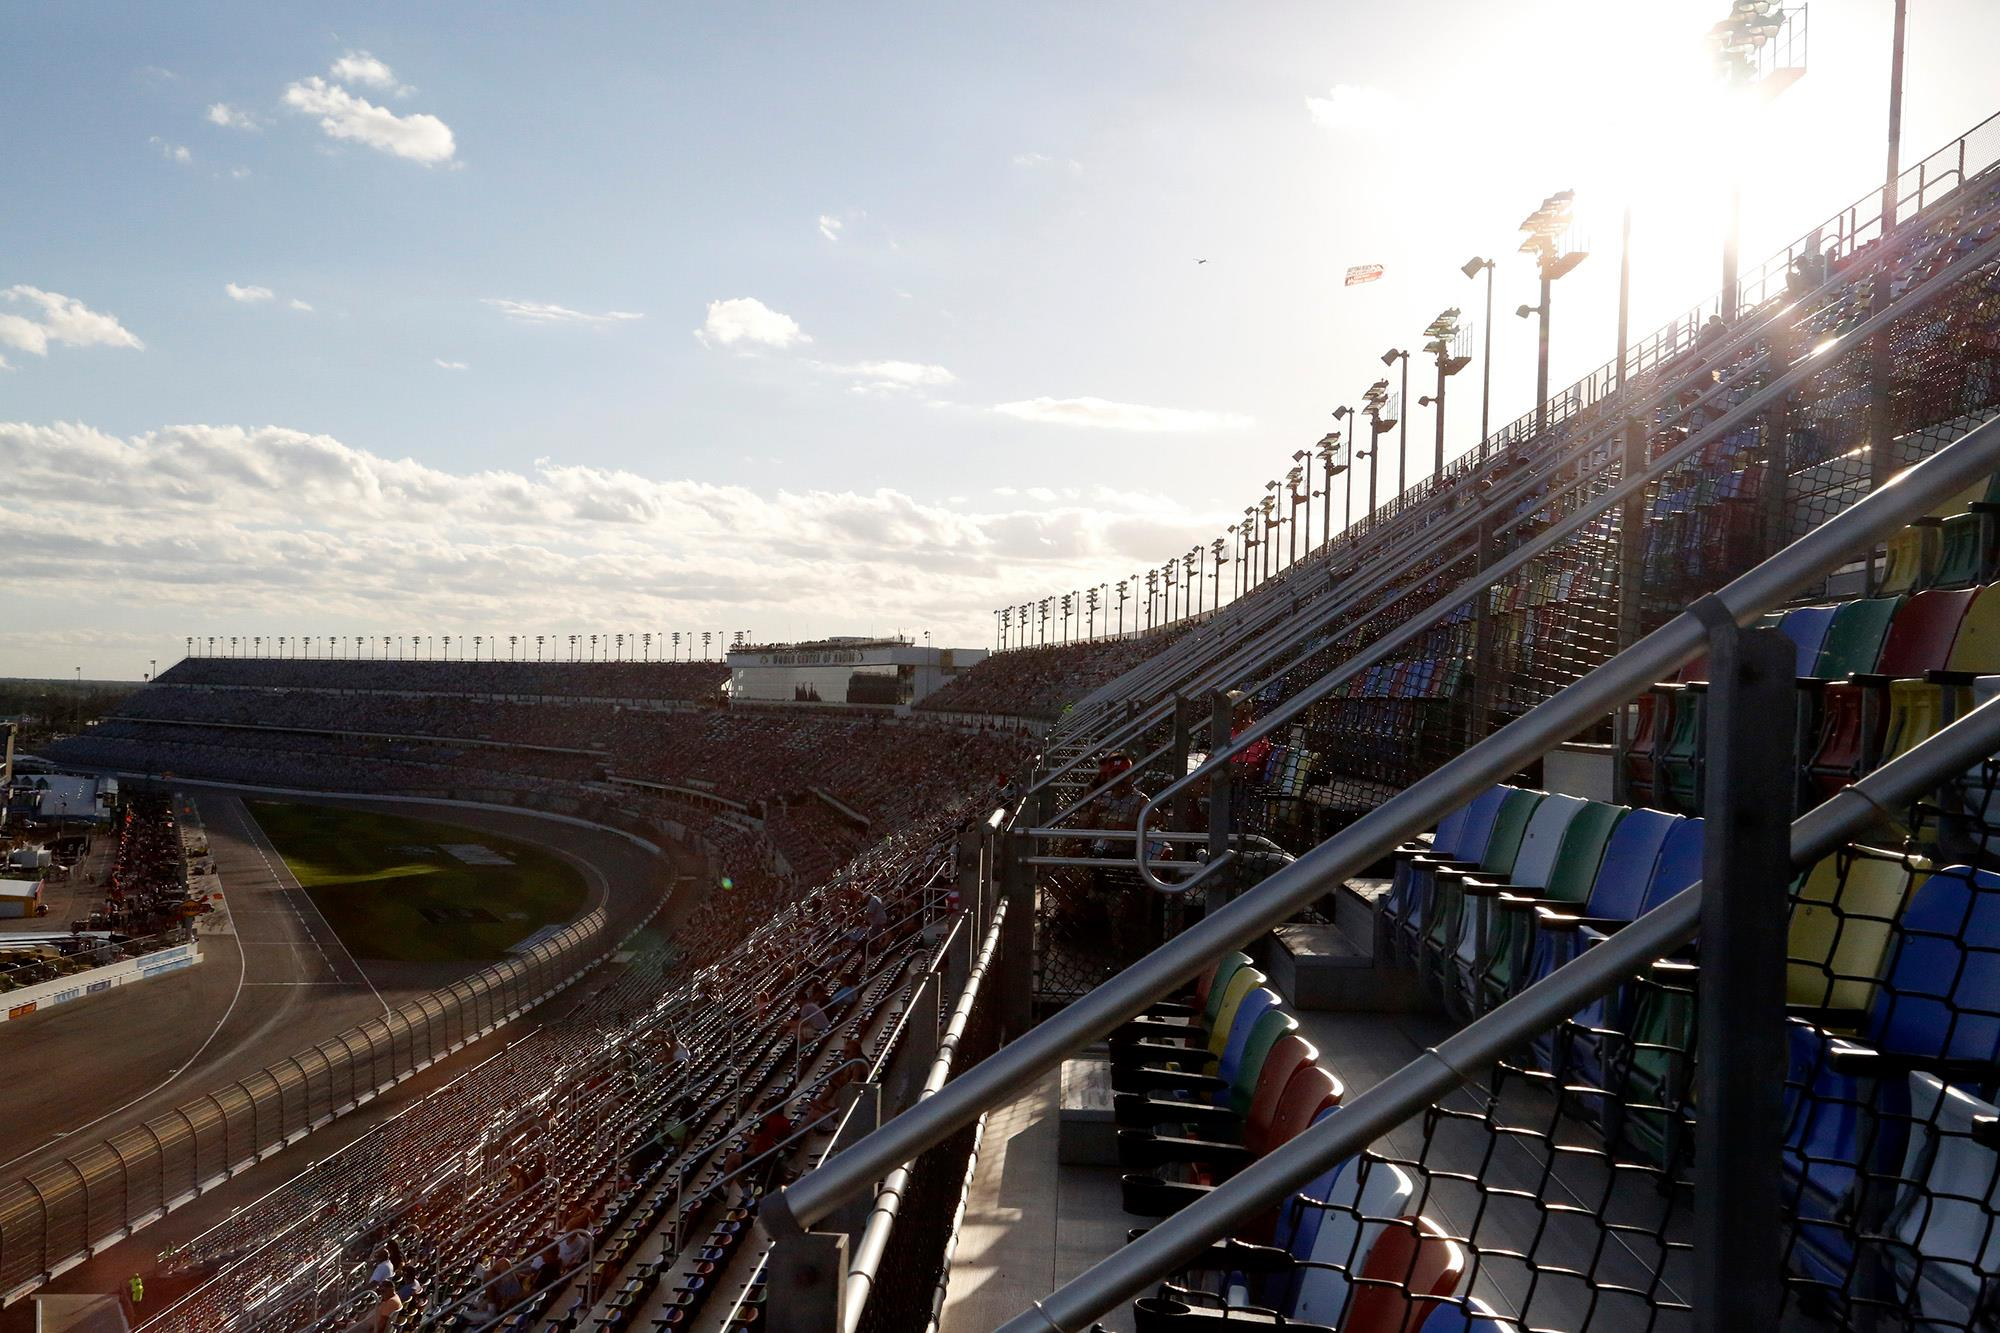 Daytona International Speedway Hurricane Irma damage update